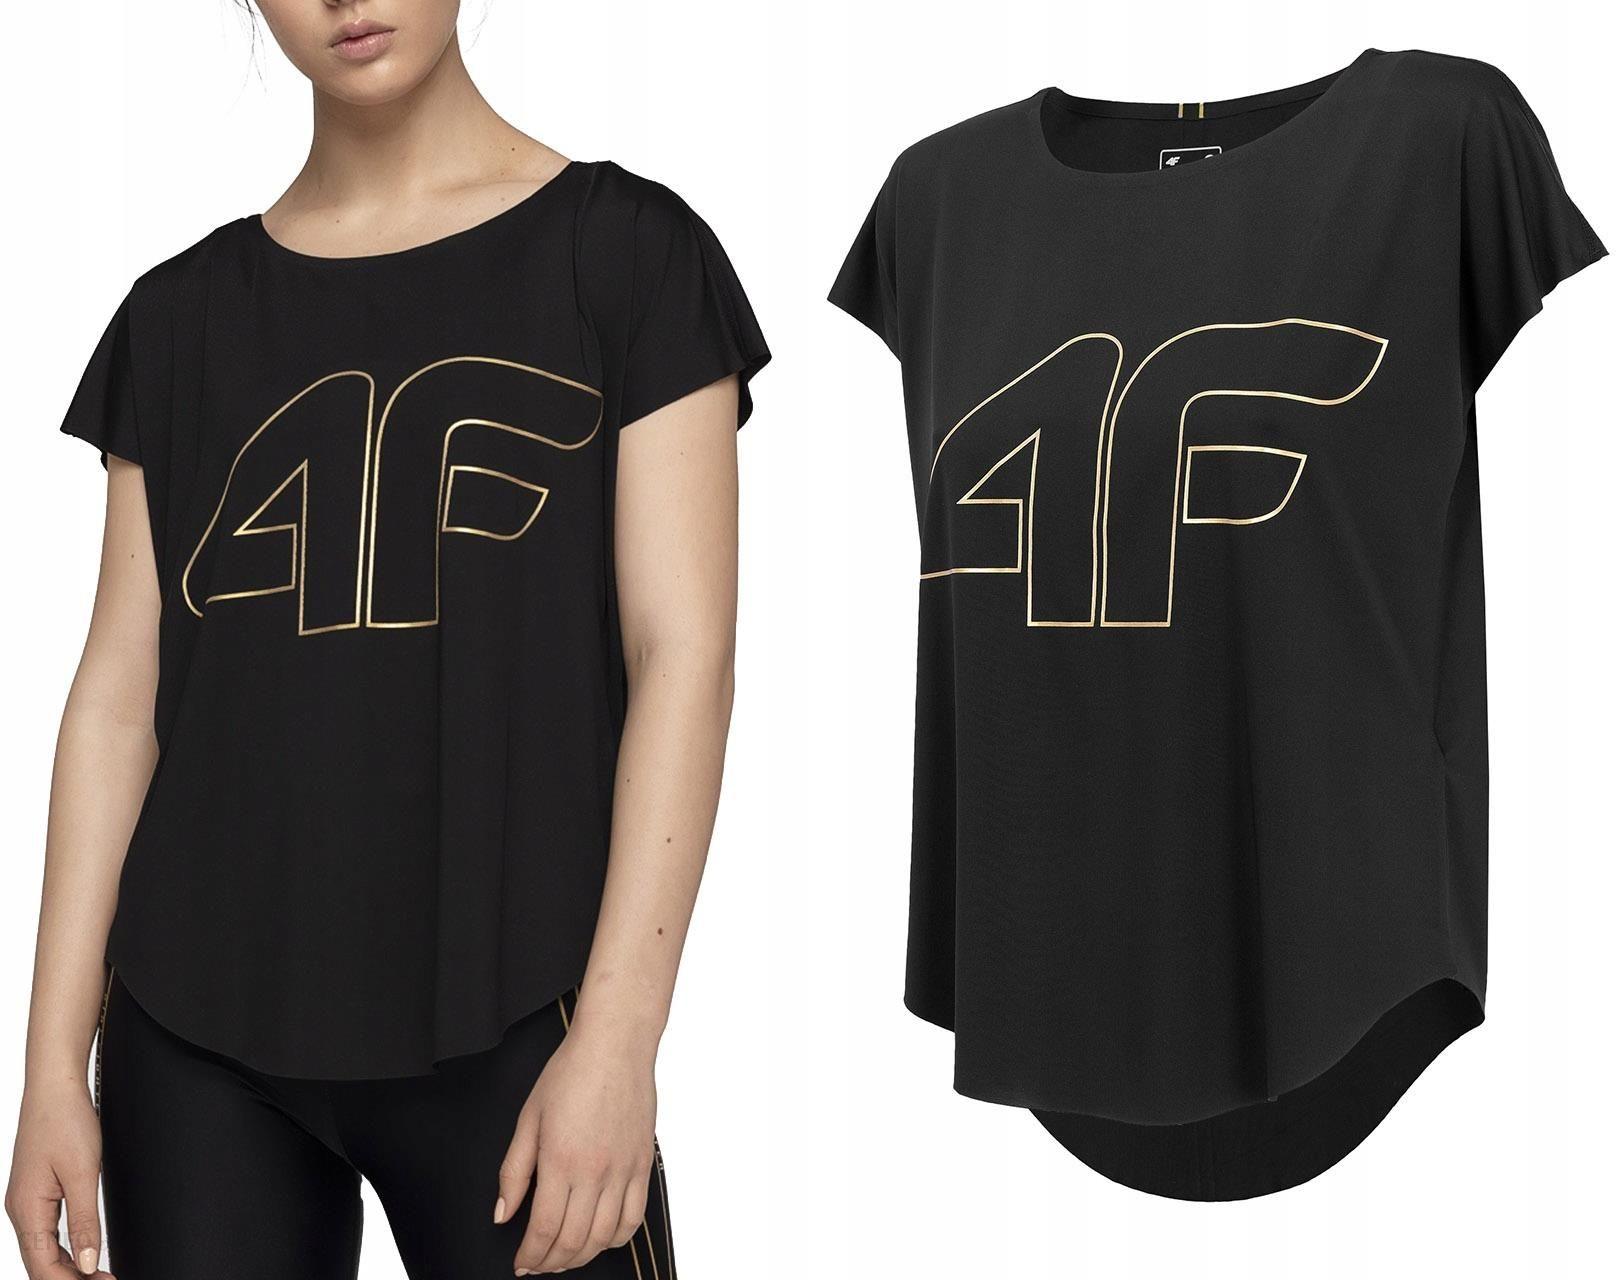 5c484cb37c0b7f 4F Koszulka Damska T-shirt Fitness oversize czarna - Ceny i opinie ...